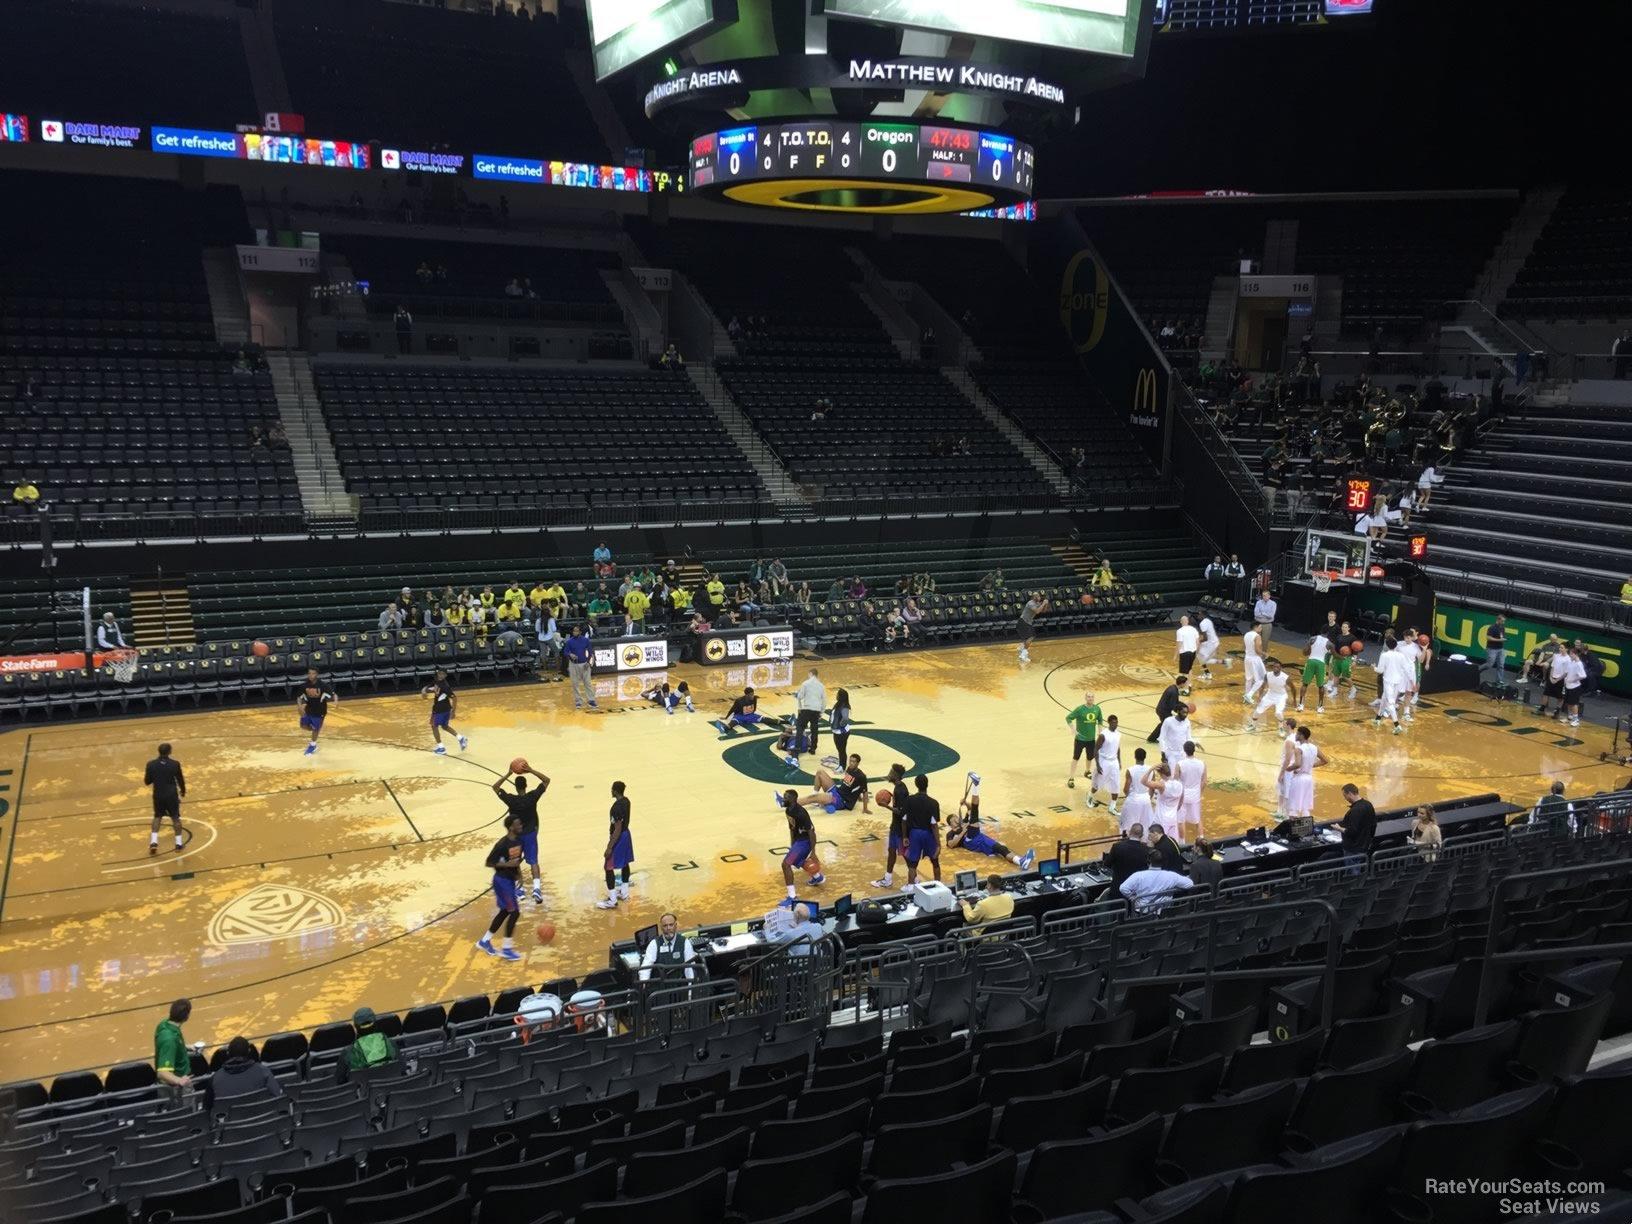 Matthew Knight Arena Oregon Seating Guide